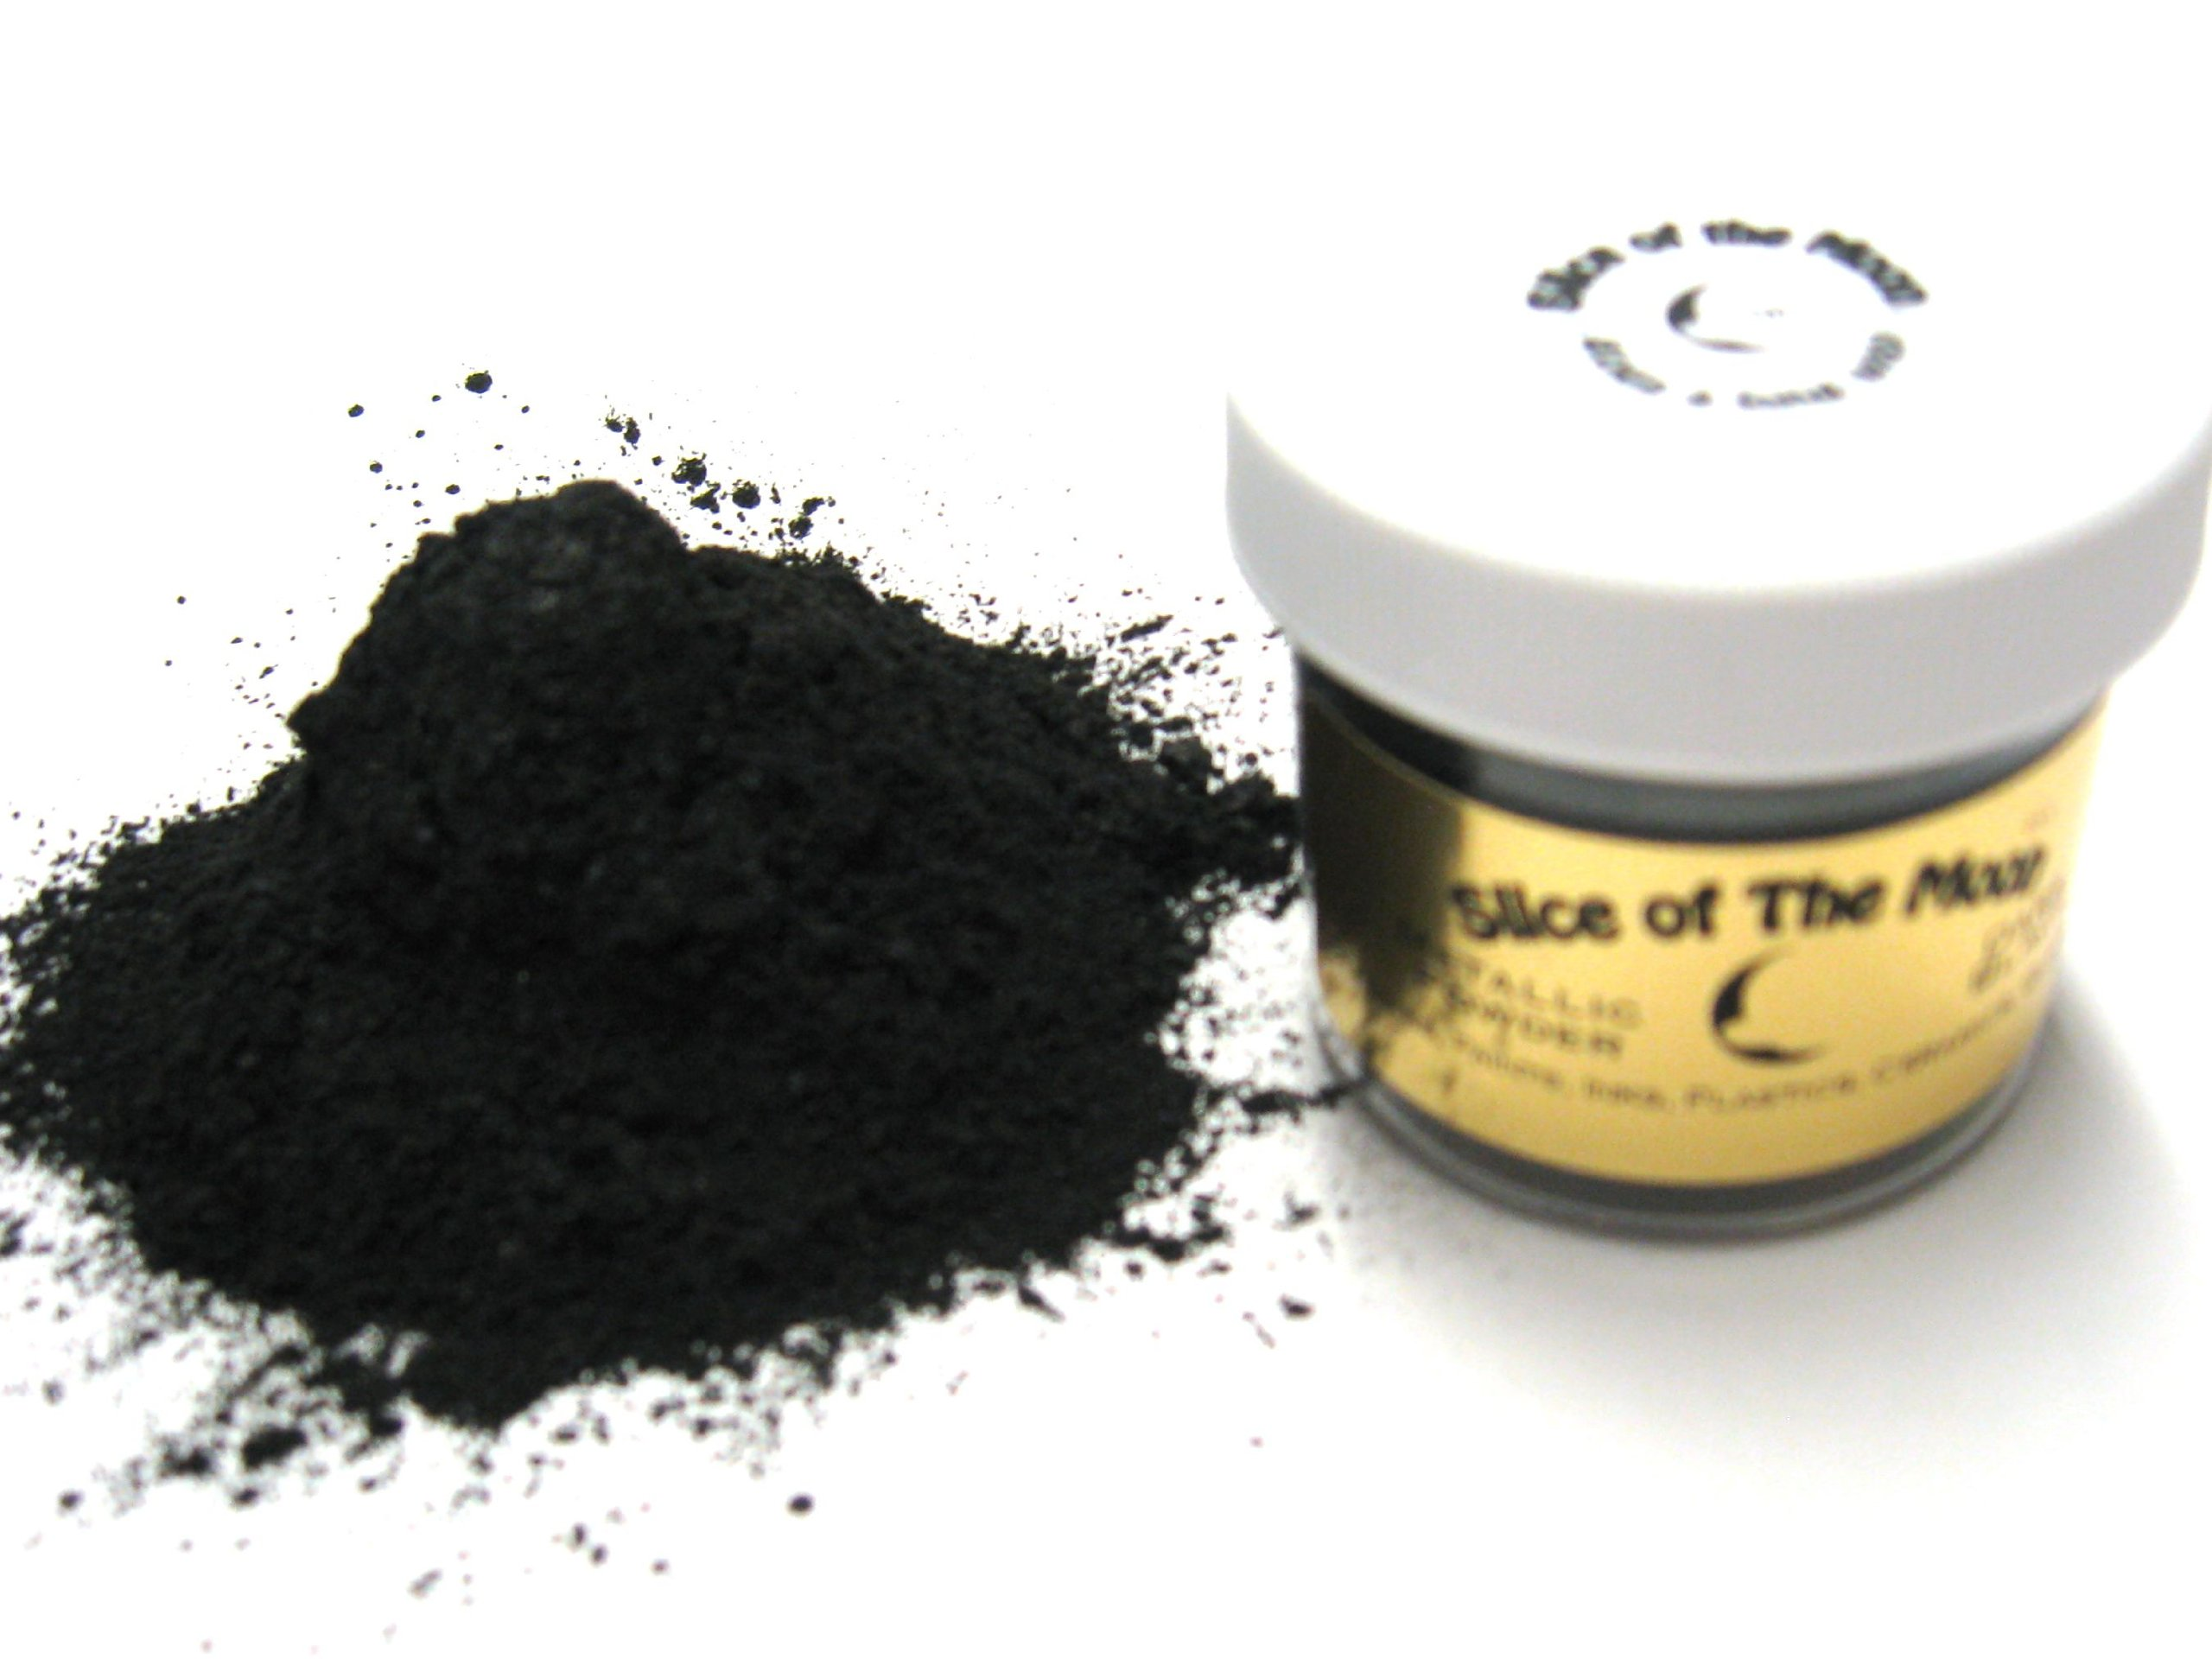 Dark Black Mica Powder 1oz, Black Metallic Powder, Pearl Pigment Powder, Cosmetic Mica, Slice of the Moon